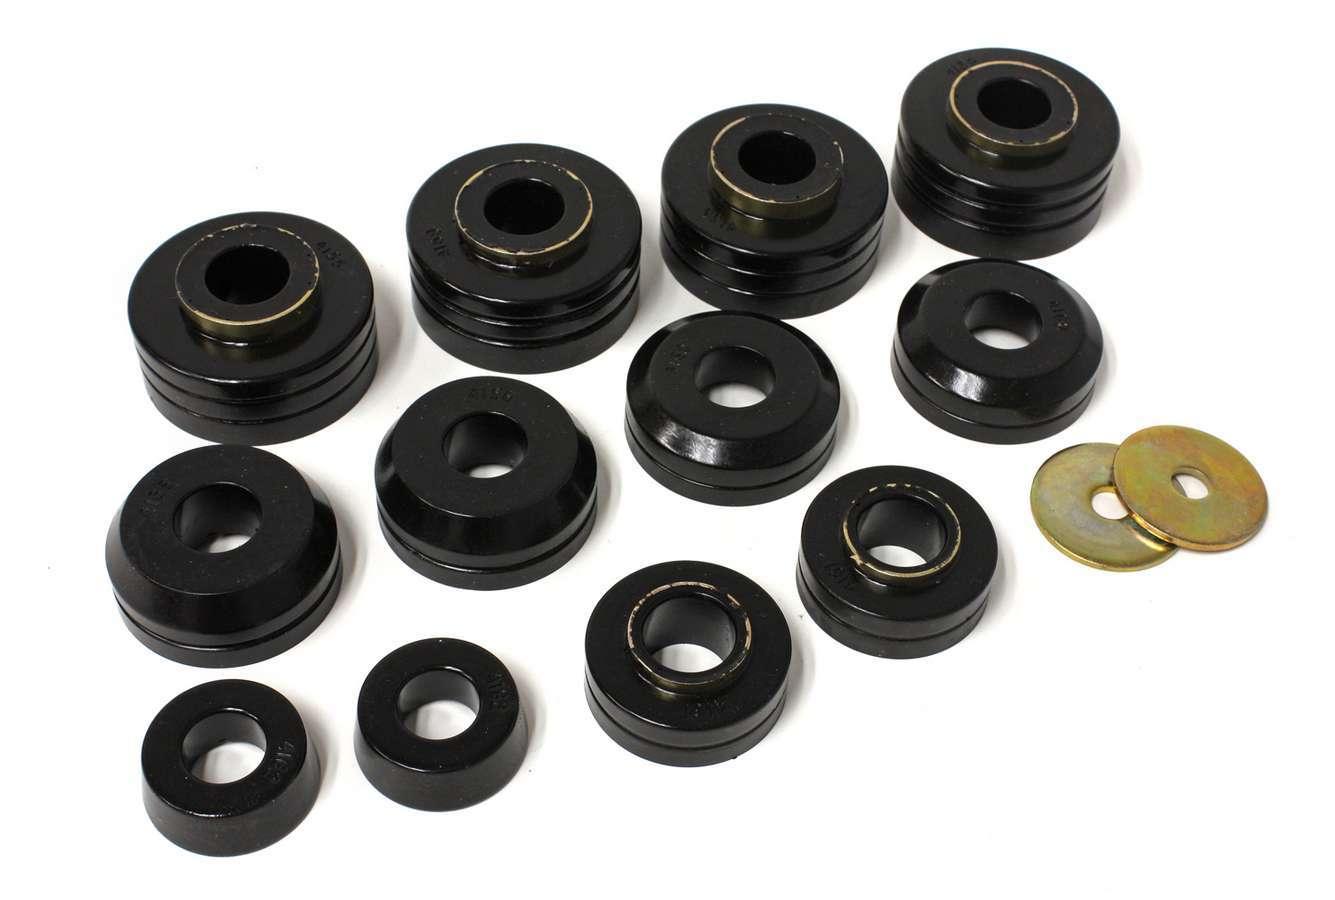 Energy Suspension Ford Body Mounts - Black